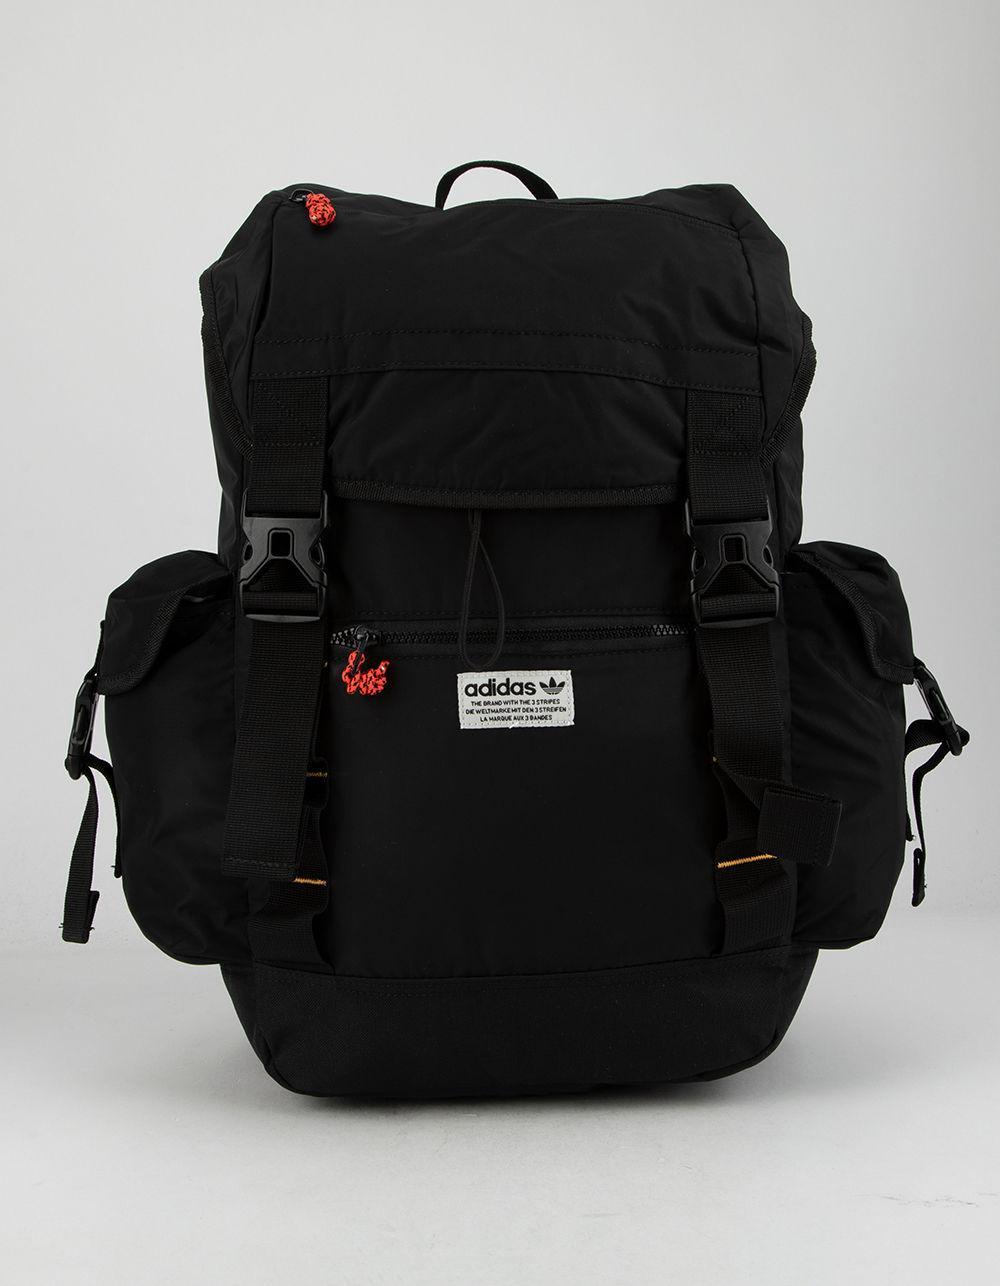 7b2ab660d2 Adidas - Originals Urban Utility Black Backpack for Men - Lyst. View  fullscreen